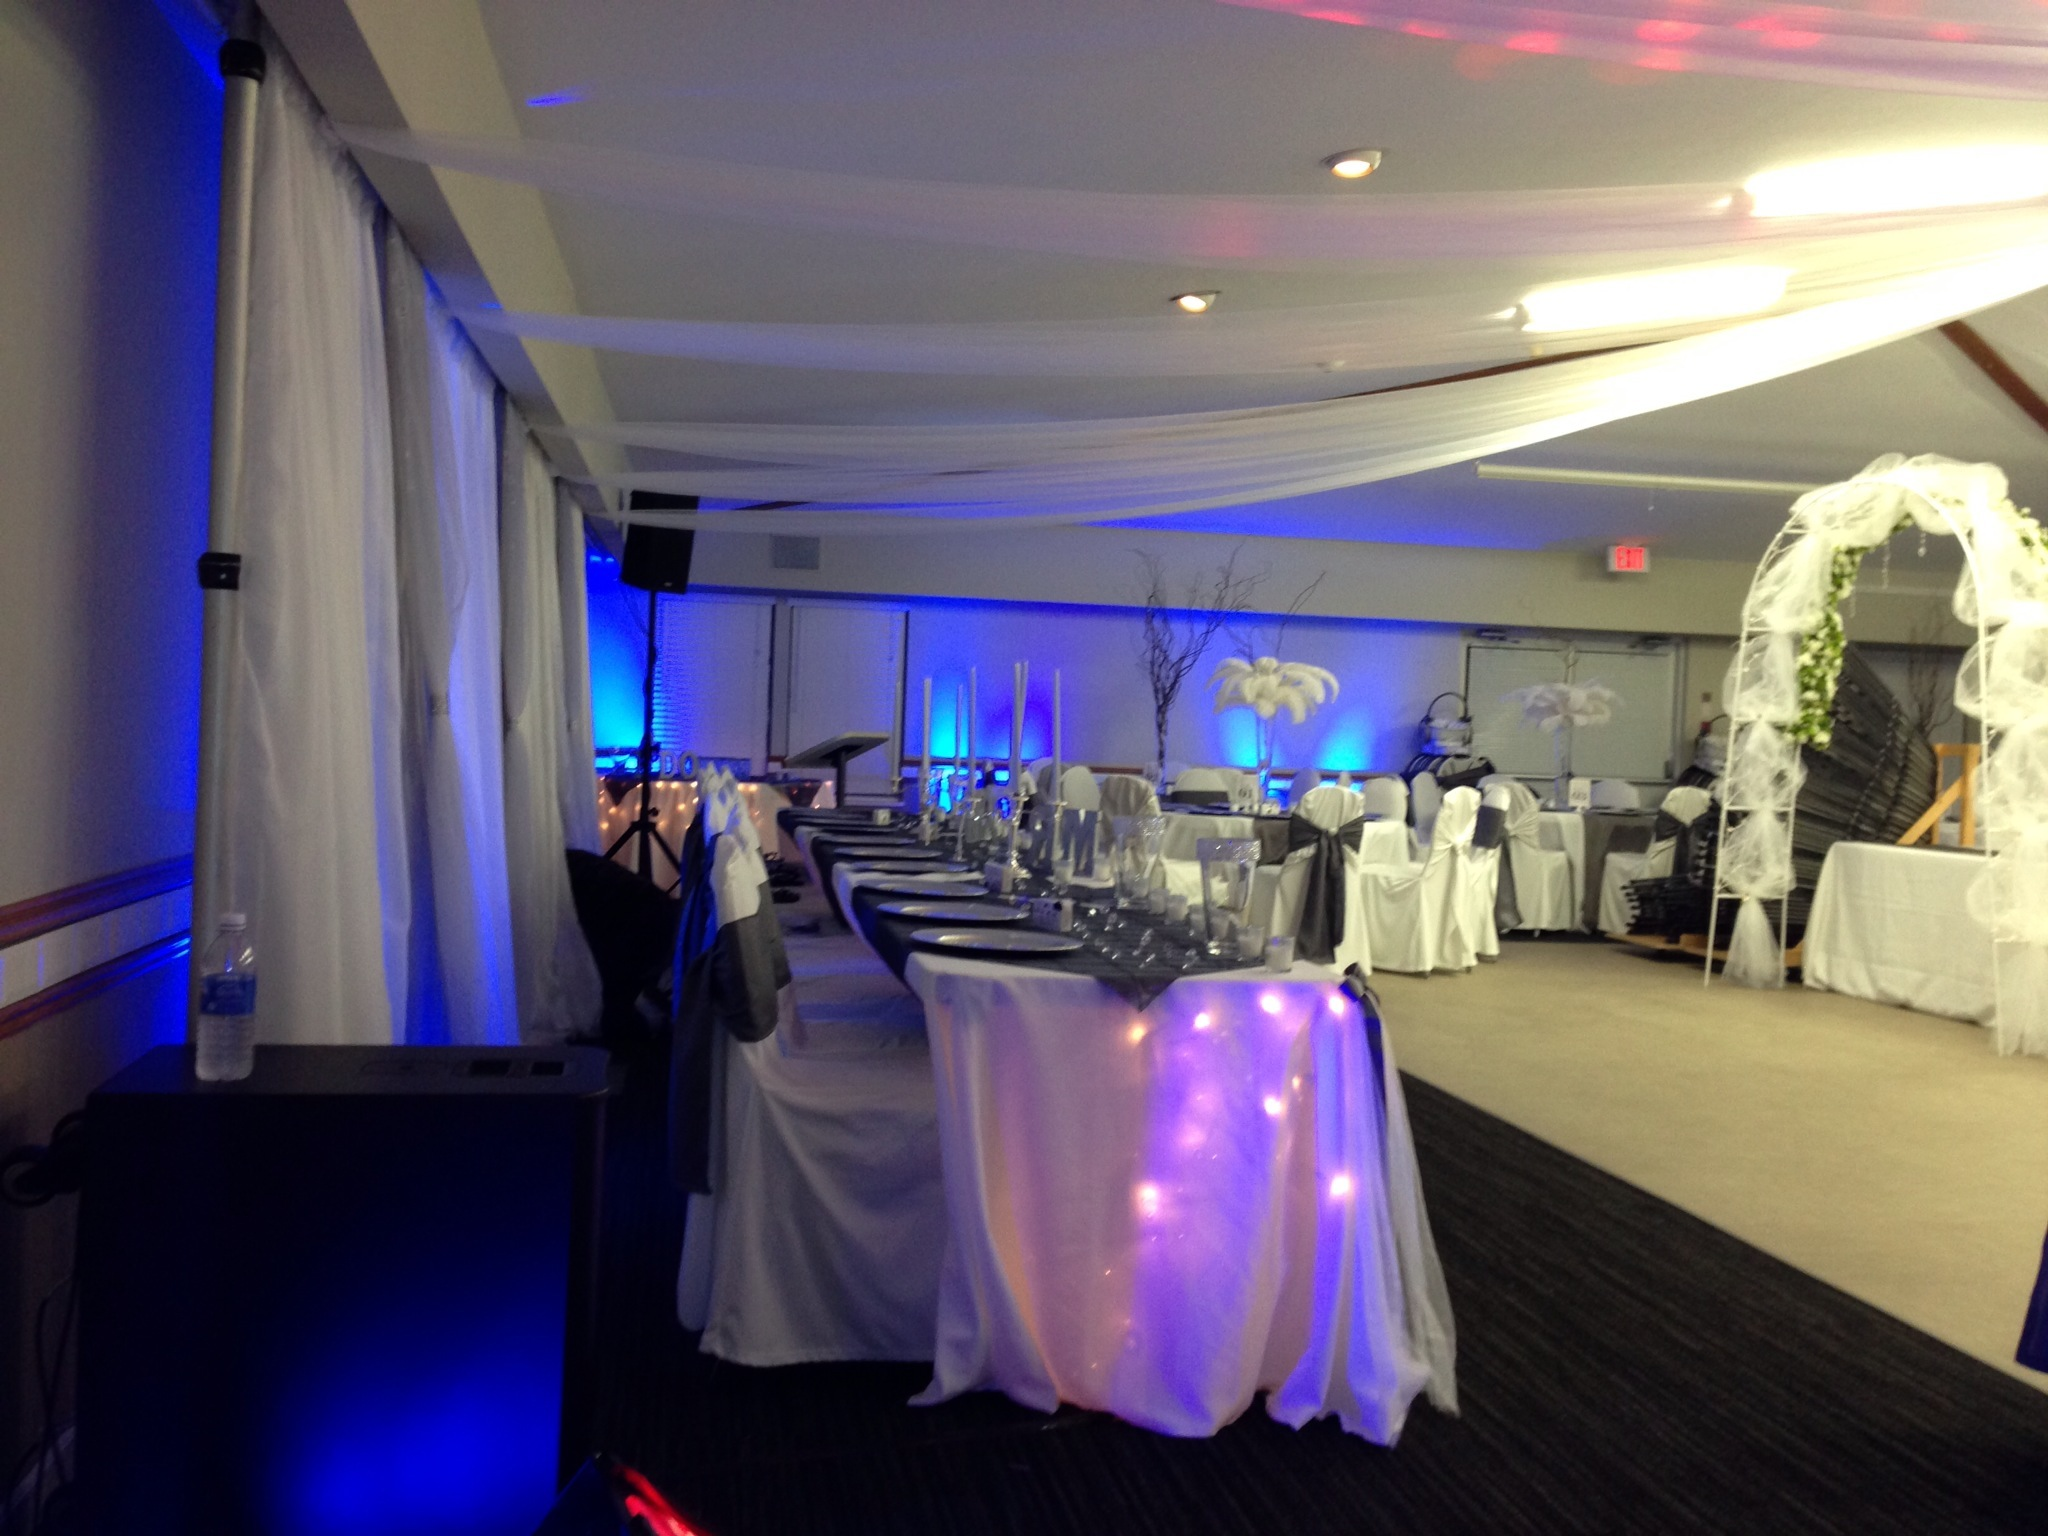 Setting up decor